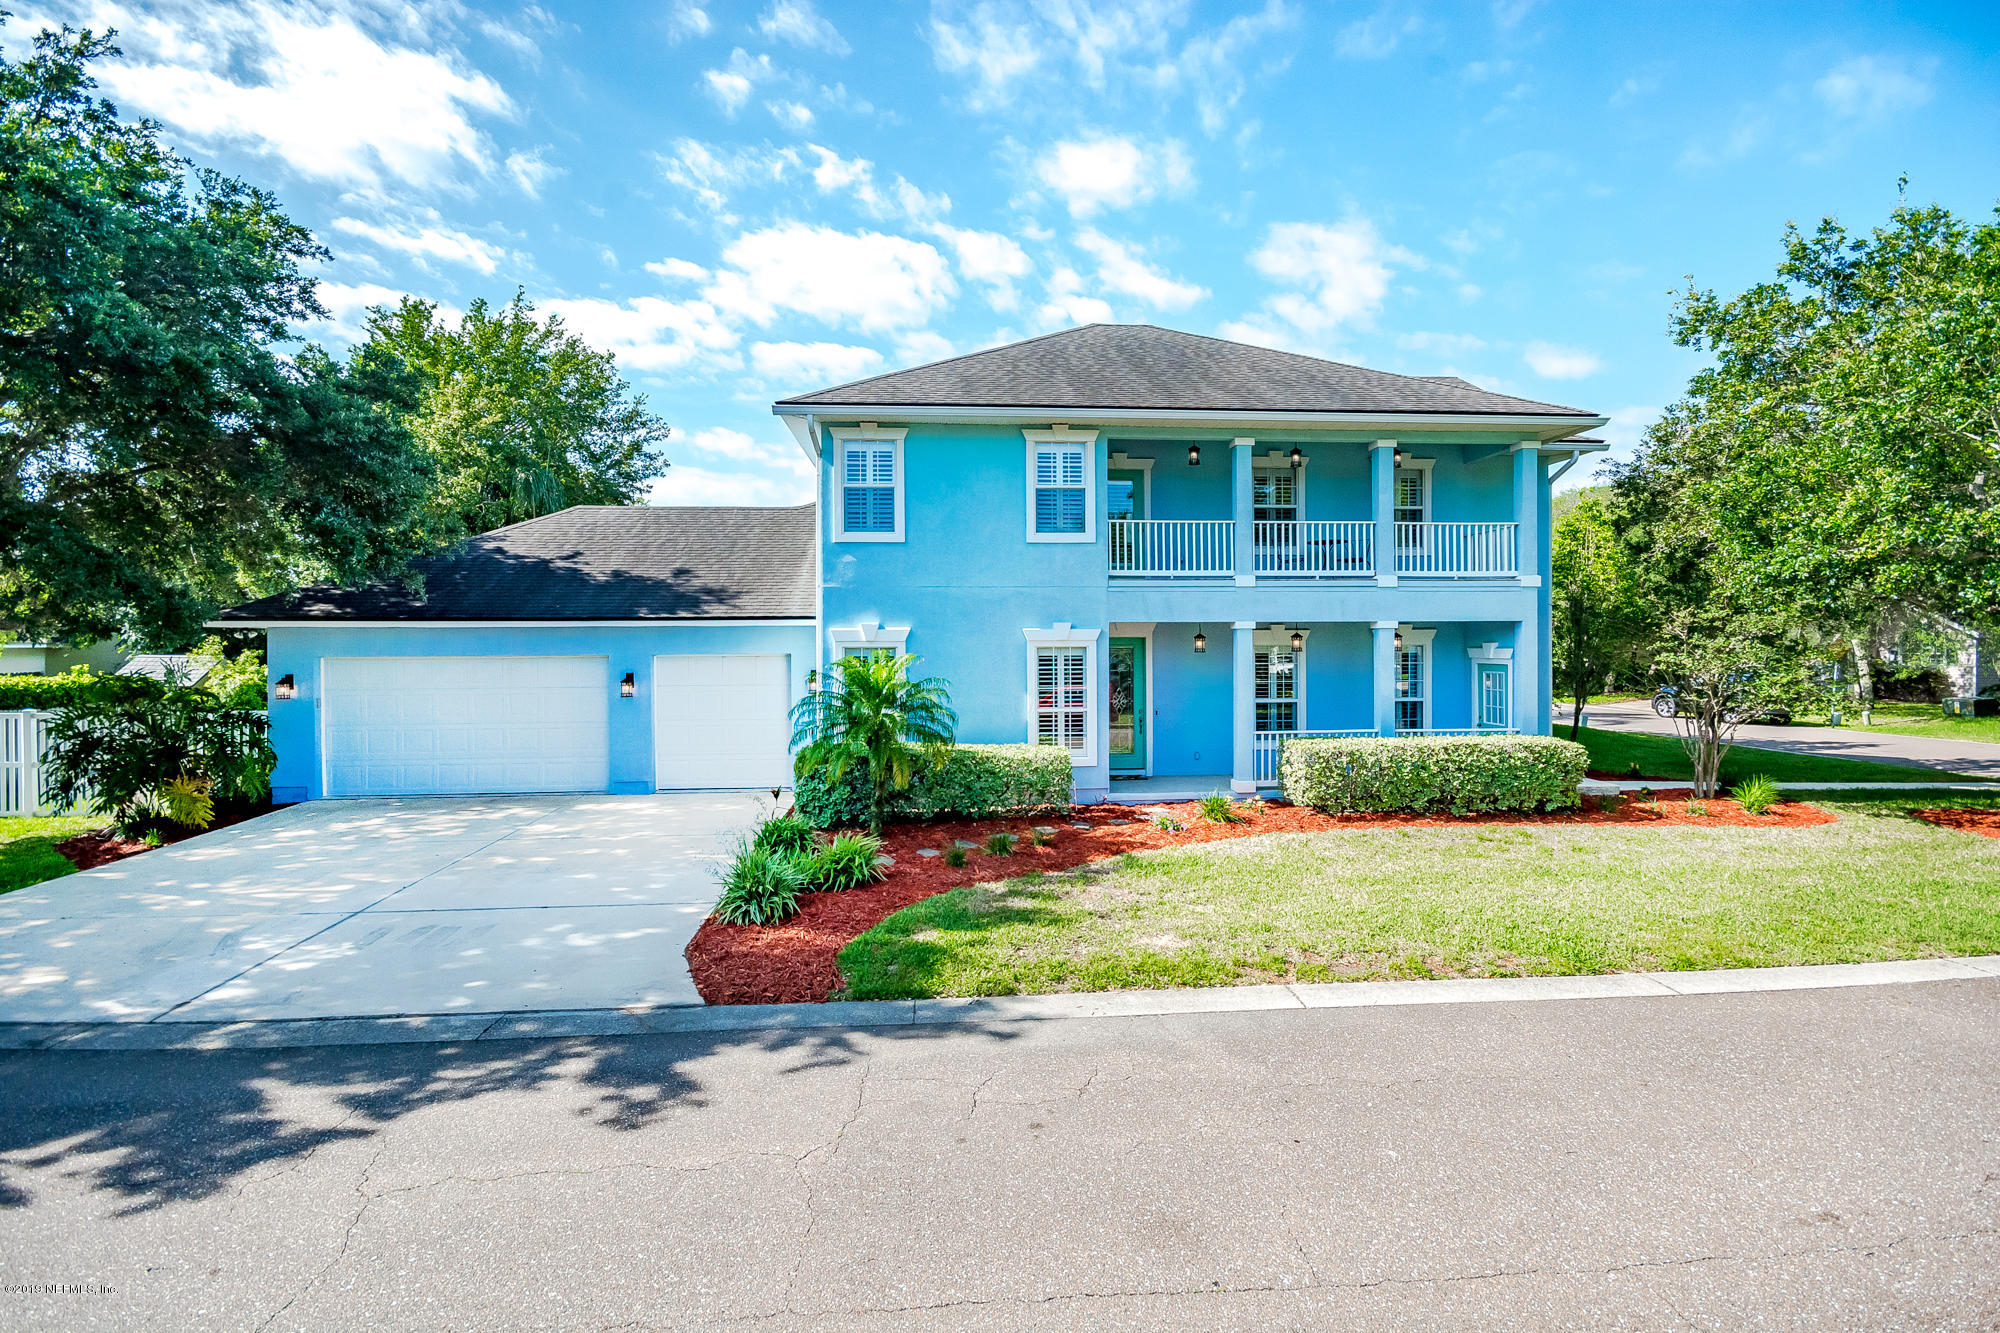 3079 MERRILL, JACKSONVILLE BEACH, FLORIDA 32250, 5 Bedrooms Bedrooms, ,3 BathroomsBathrooms,Residential - single family,For sale,MERRILL,995596